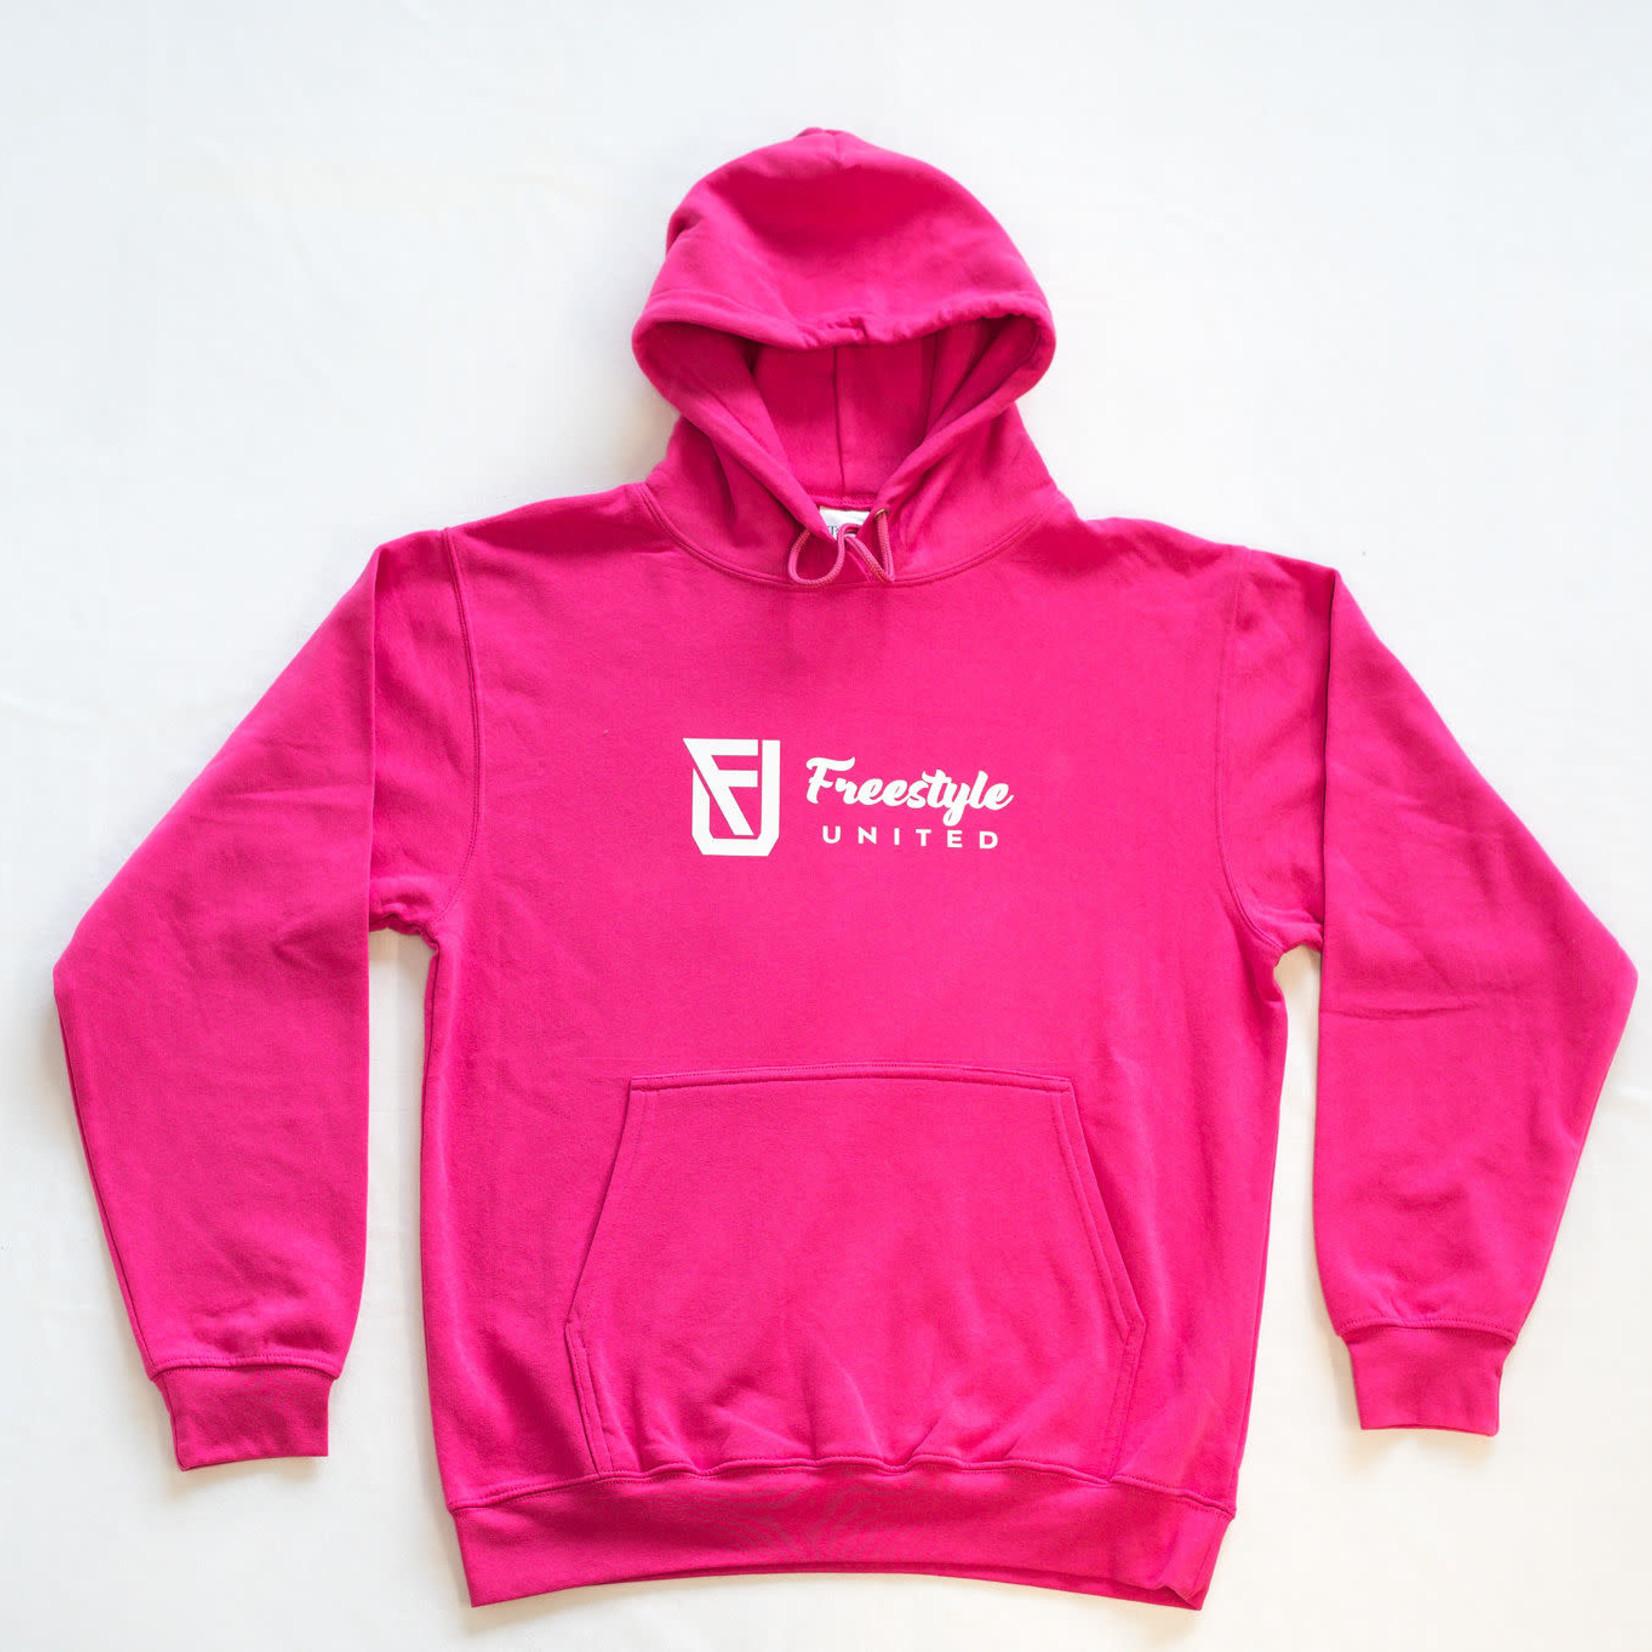 Freestyle United Freestyle United - Adult OG Hoodie - Pink